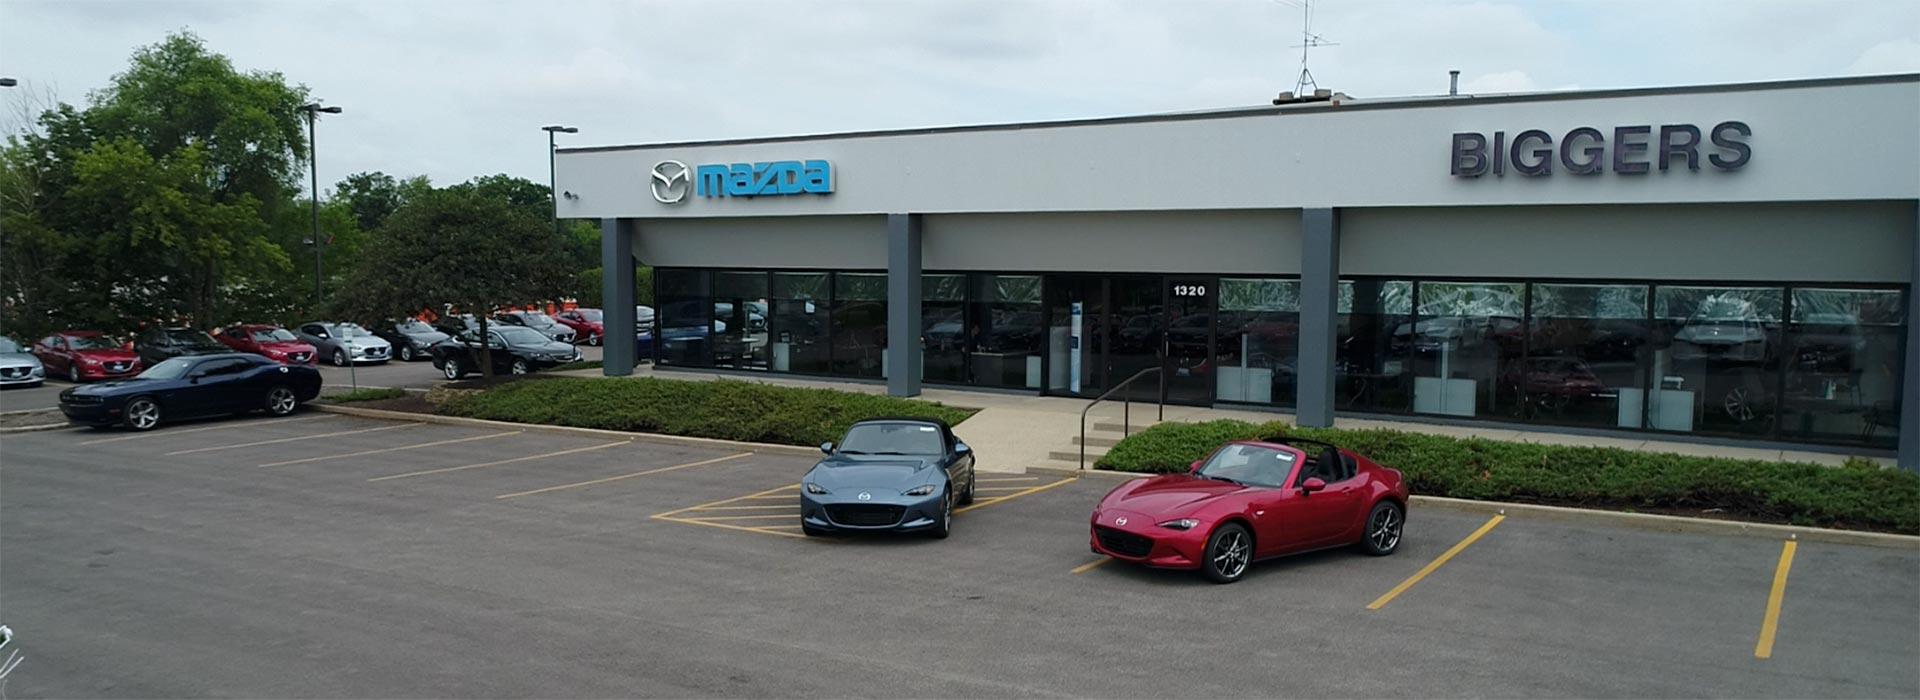 Biggers Mazda /></p>             </div>         </div>                </div> </div>   <div id=